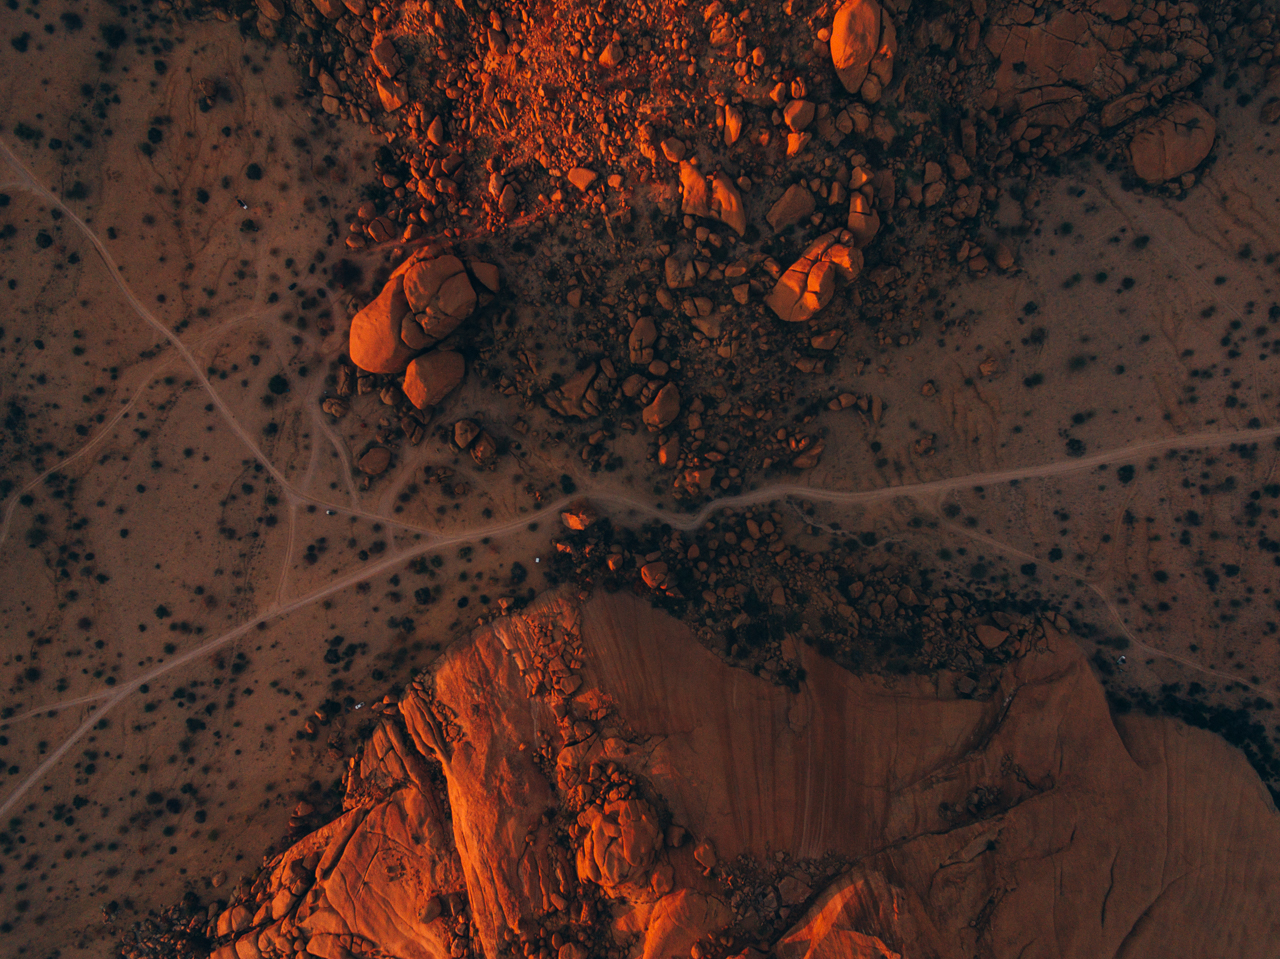 2018.04.21-05.05_Namibia_Josh Aerials-122.jpg